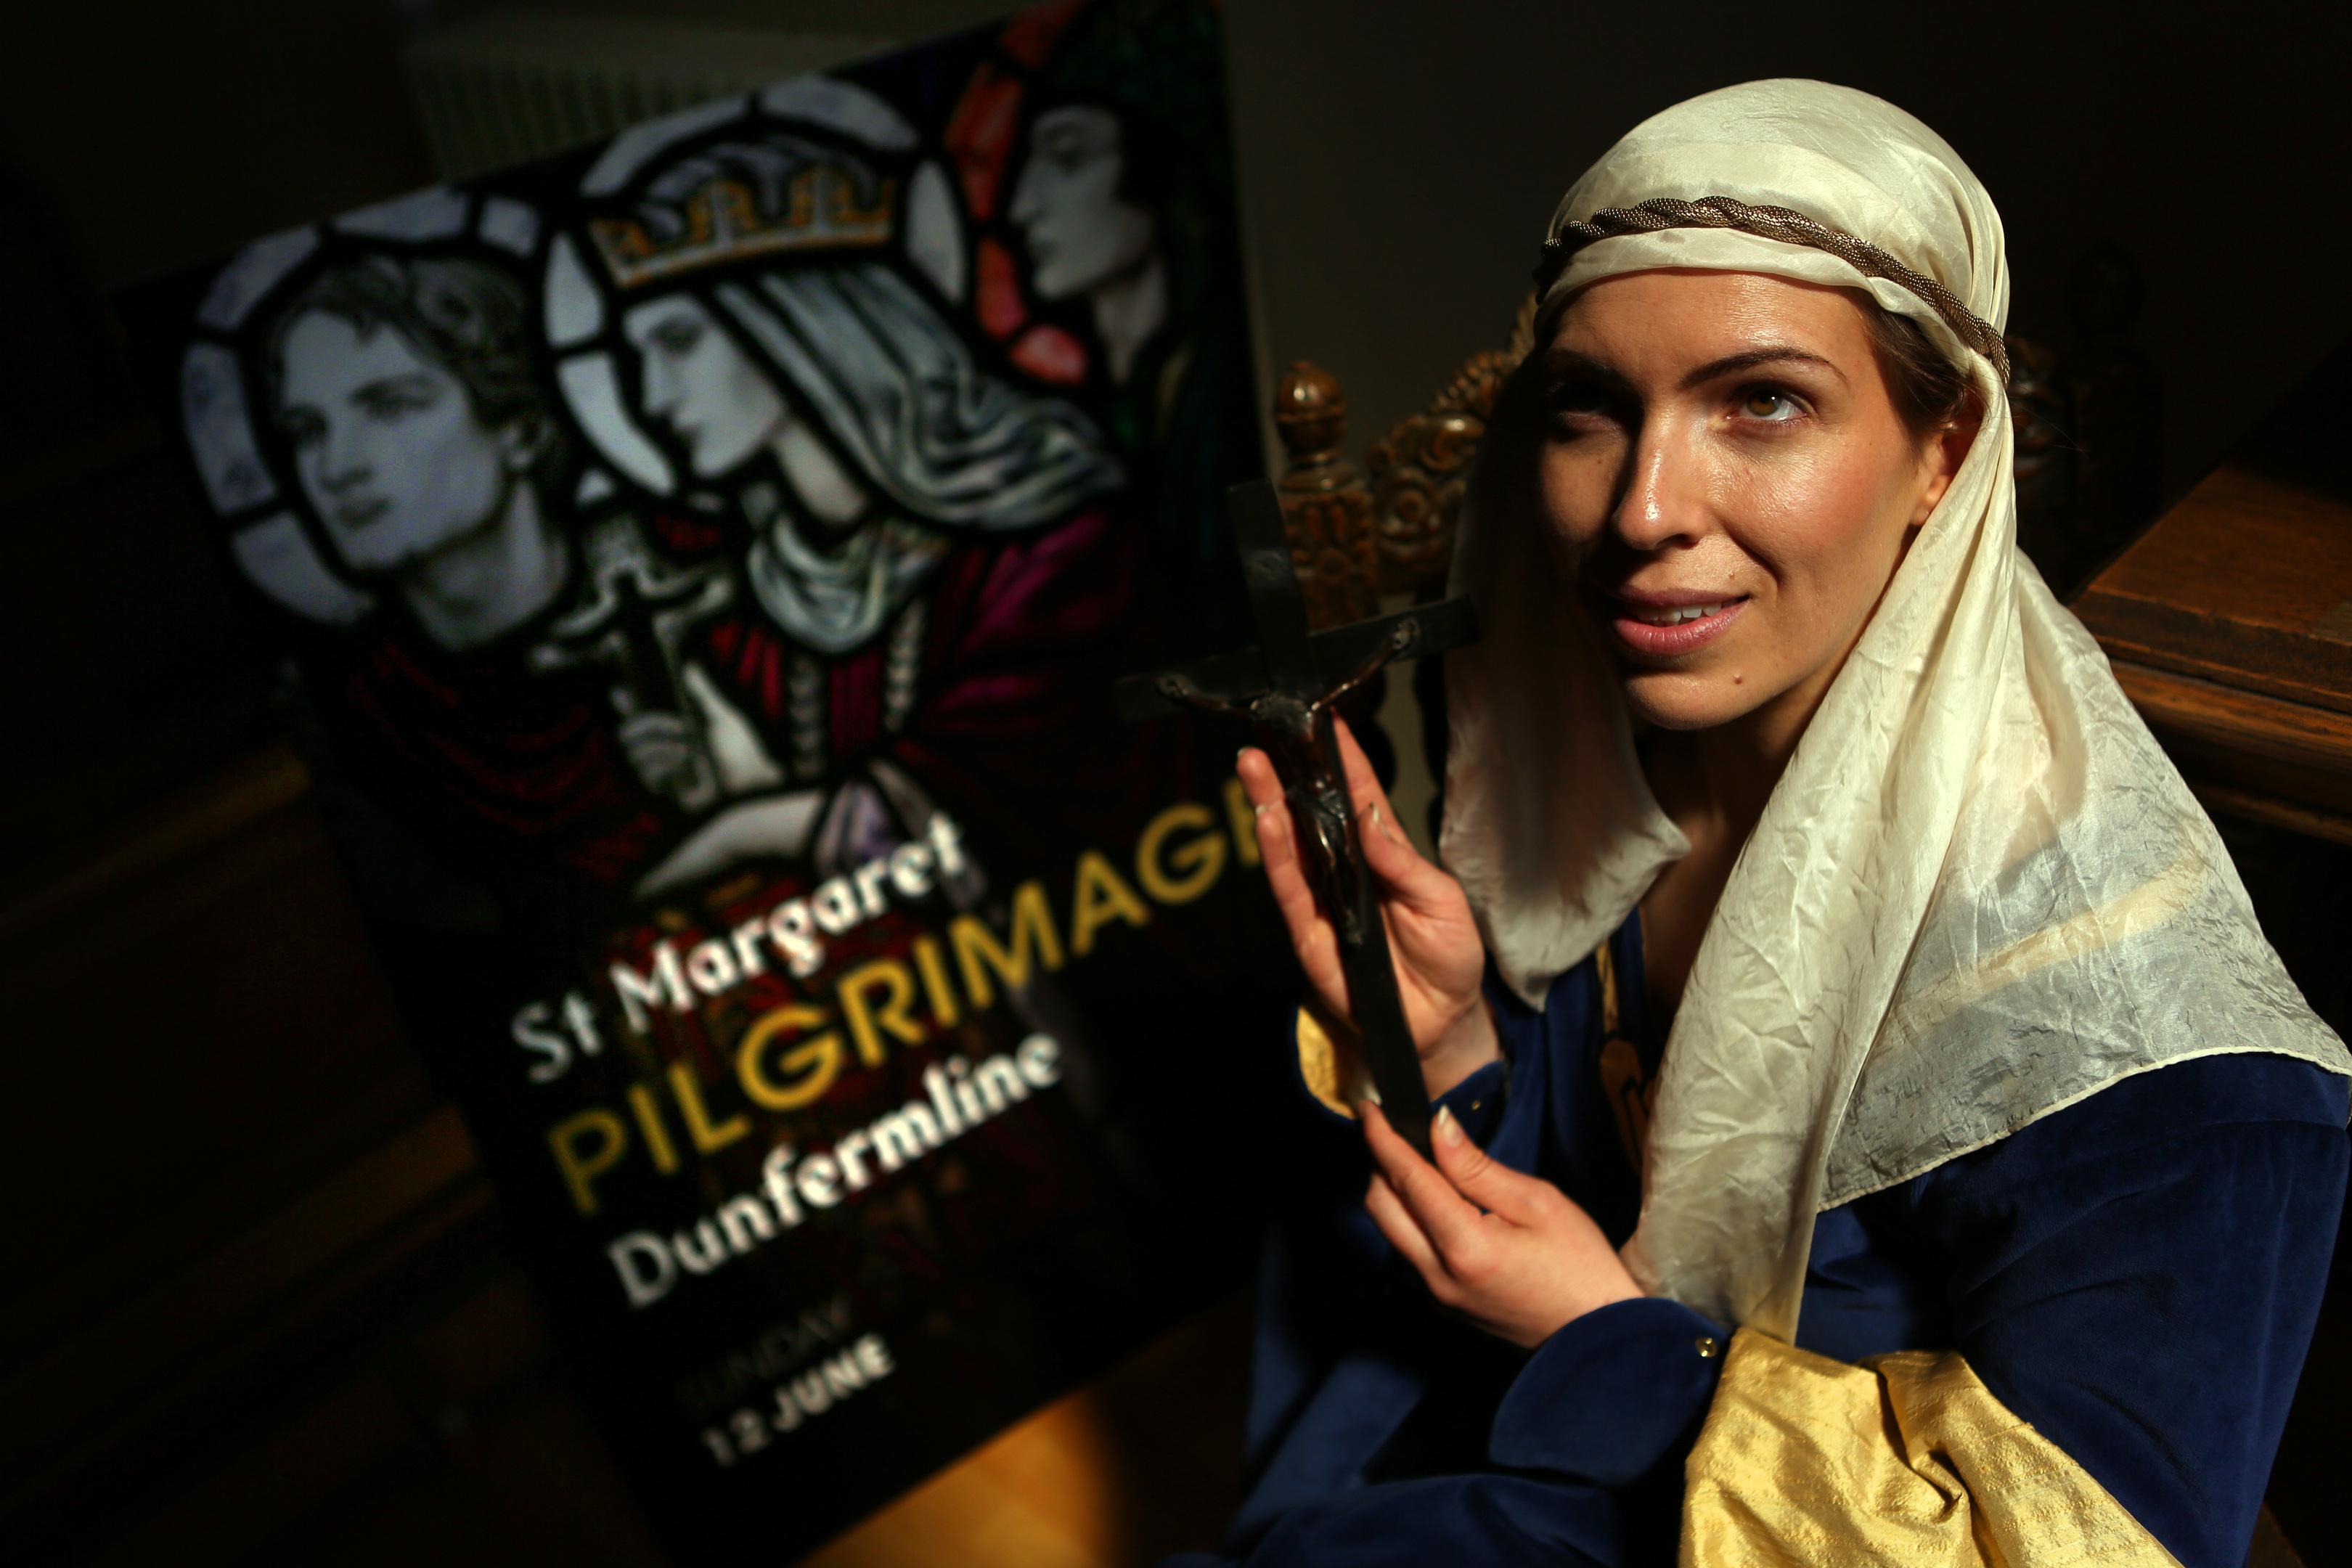 Katie Milne as St Margaret promoting the summer pilgrimage.